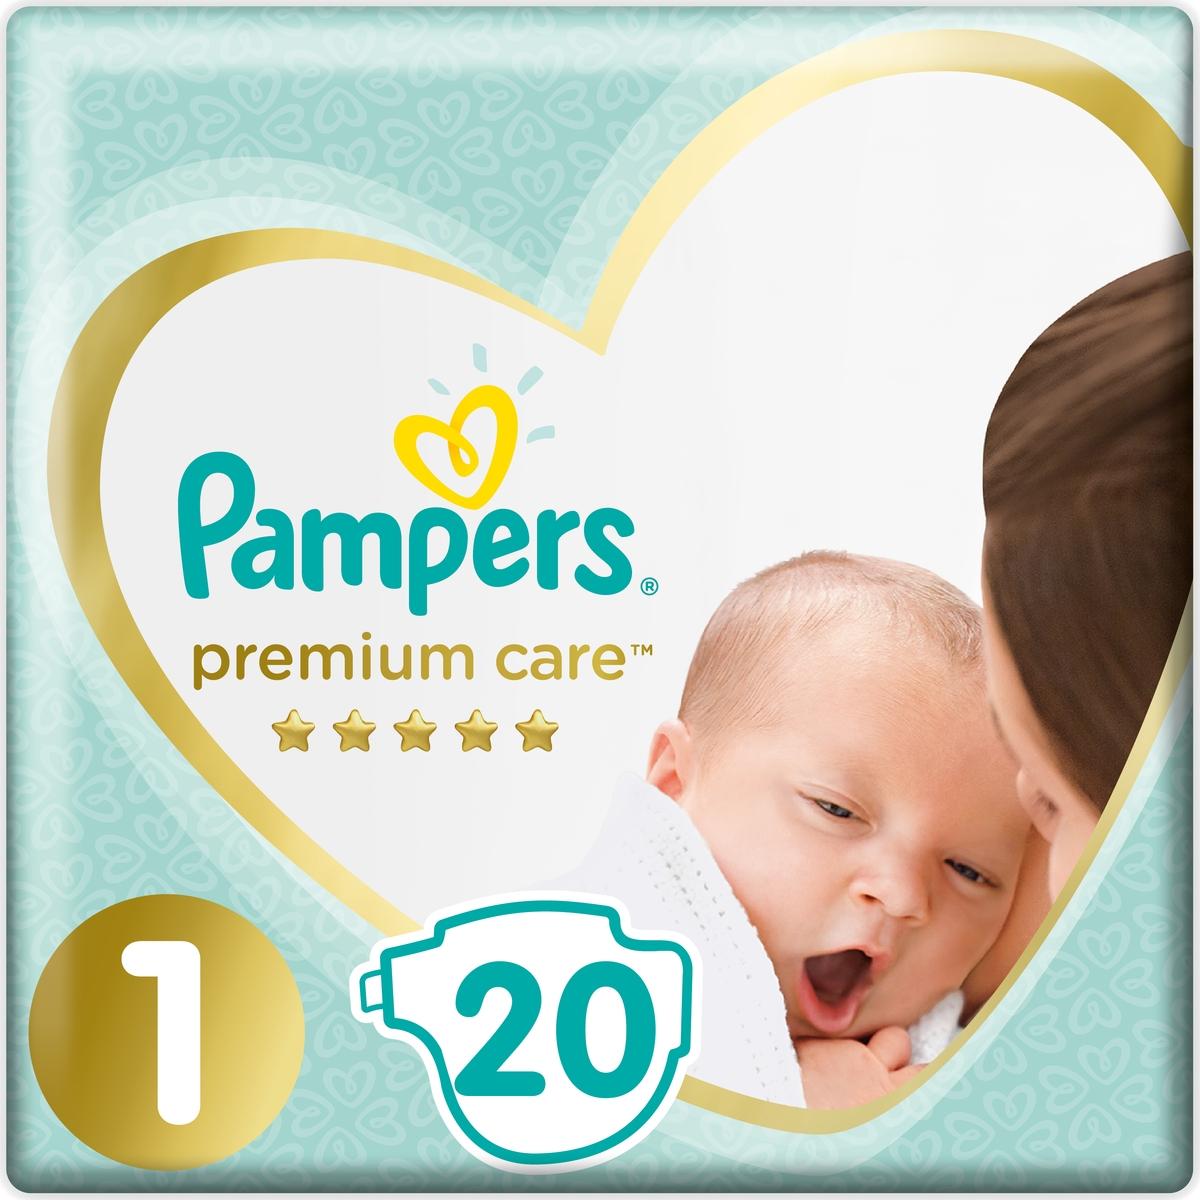 Pampers Подгузники Premium Care 2-5 кг (размер 1) 20 шт подгузники pampers premium care 5 11 кг 64 шт